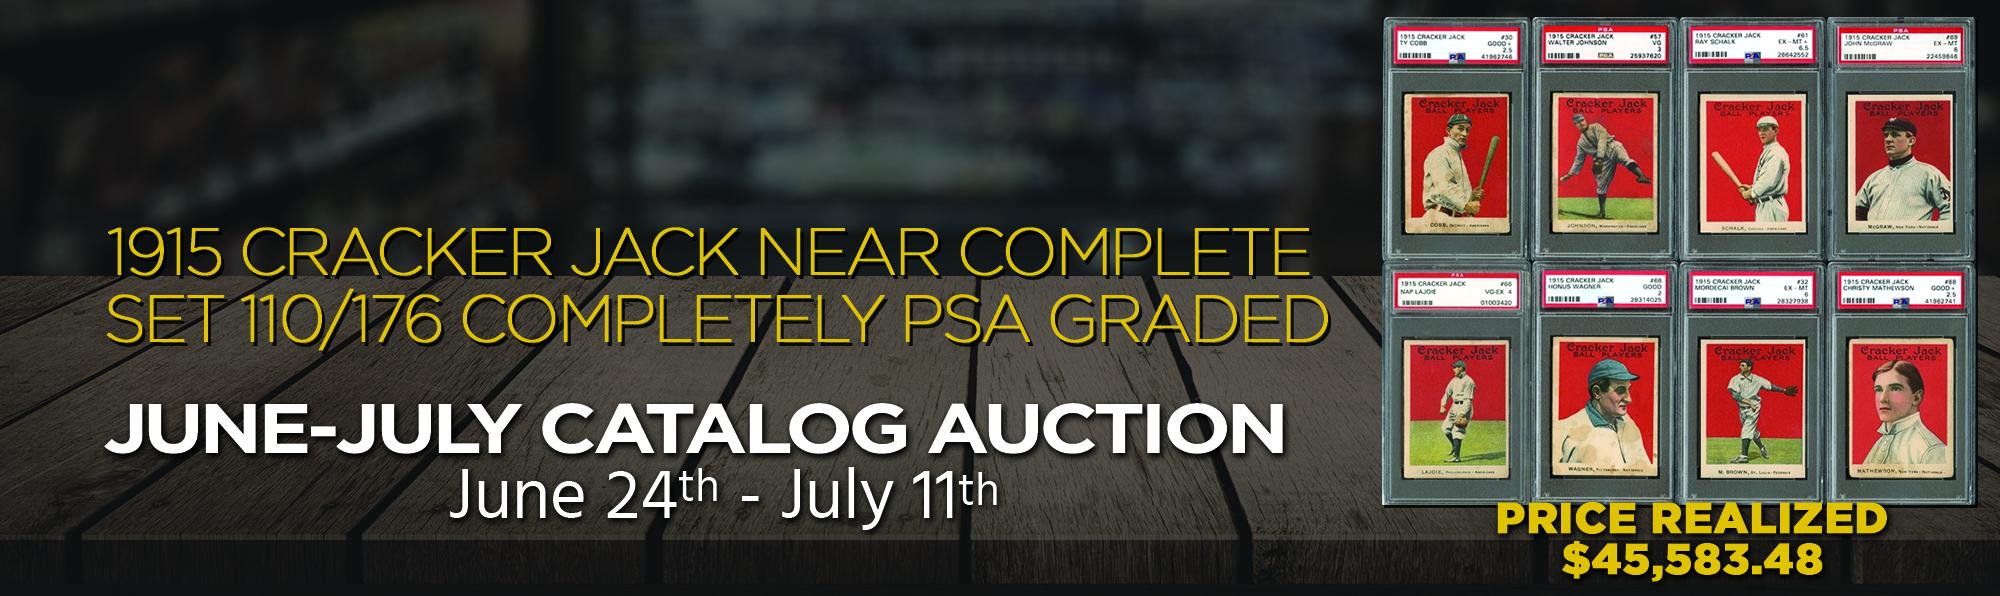 1915 Cracker Jack Set Completely PSA Graded